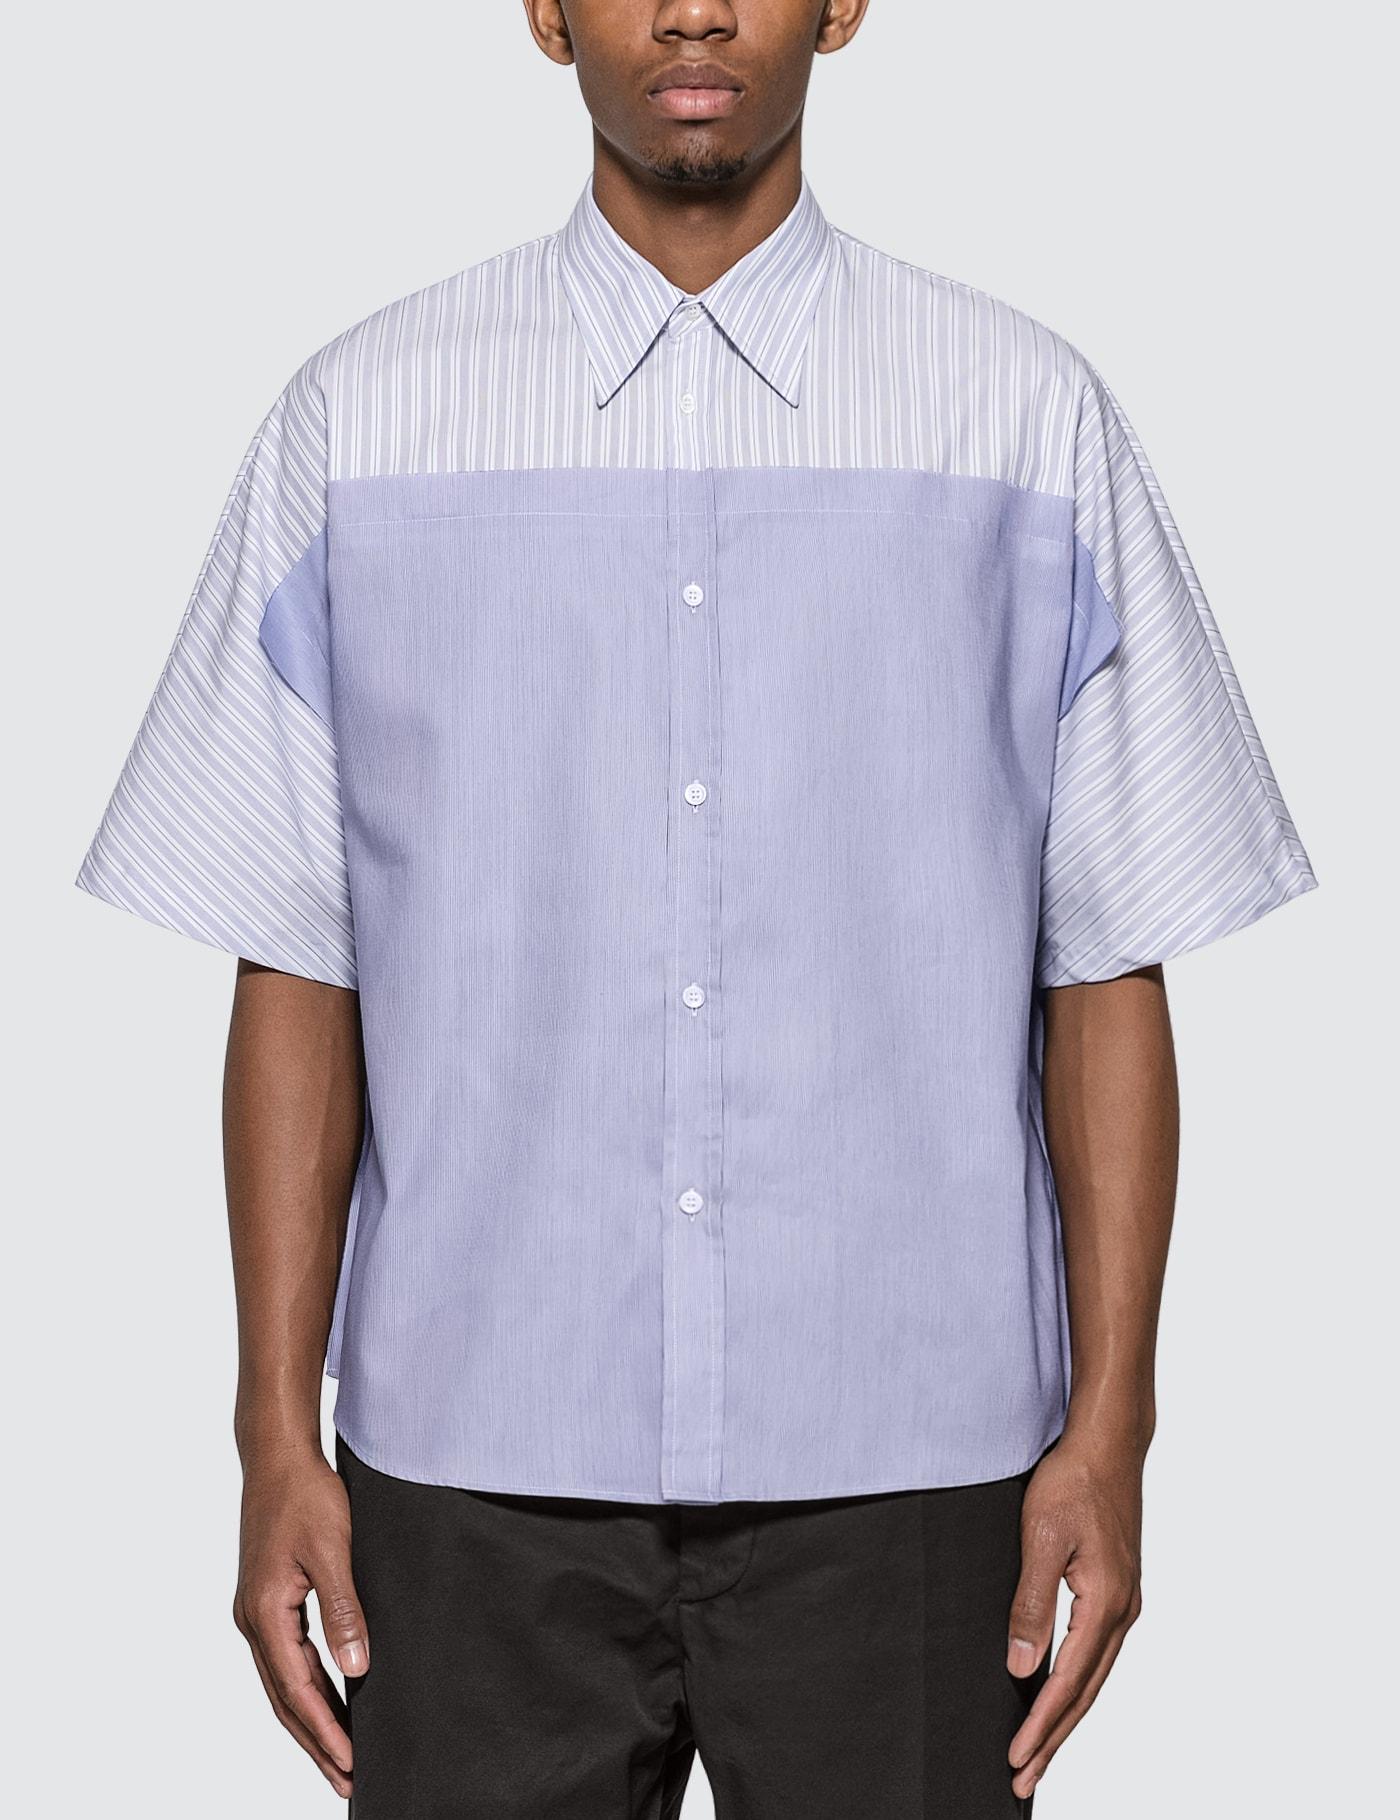 Spliced Pinstripe Shirt